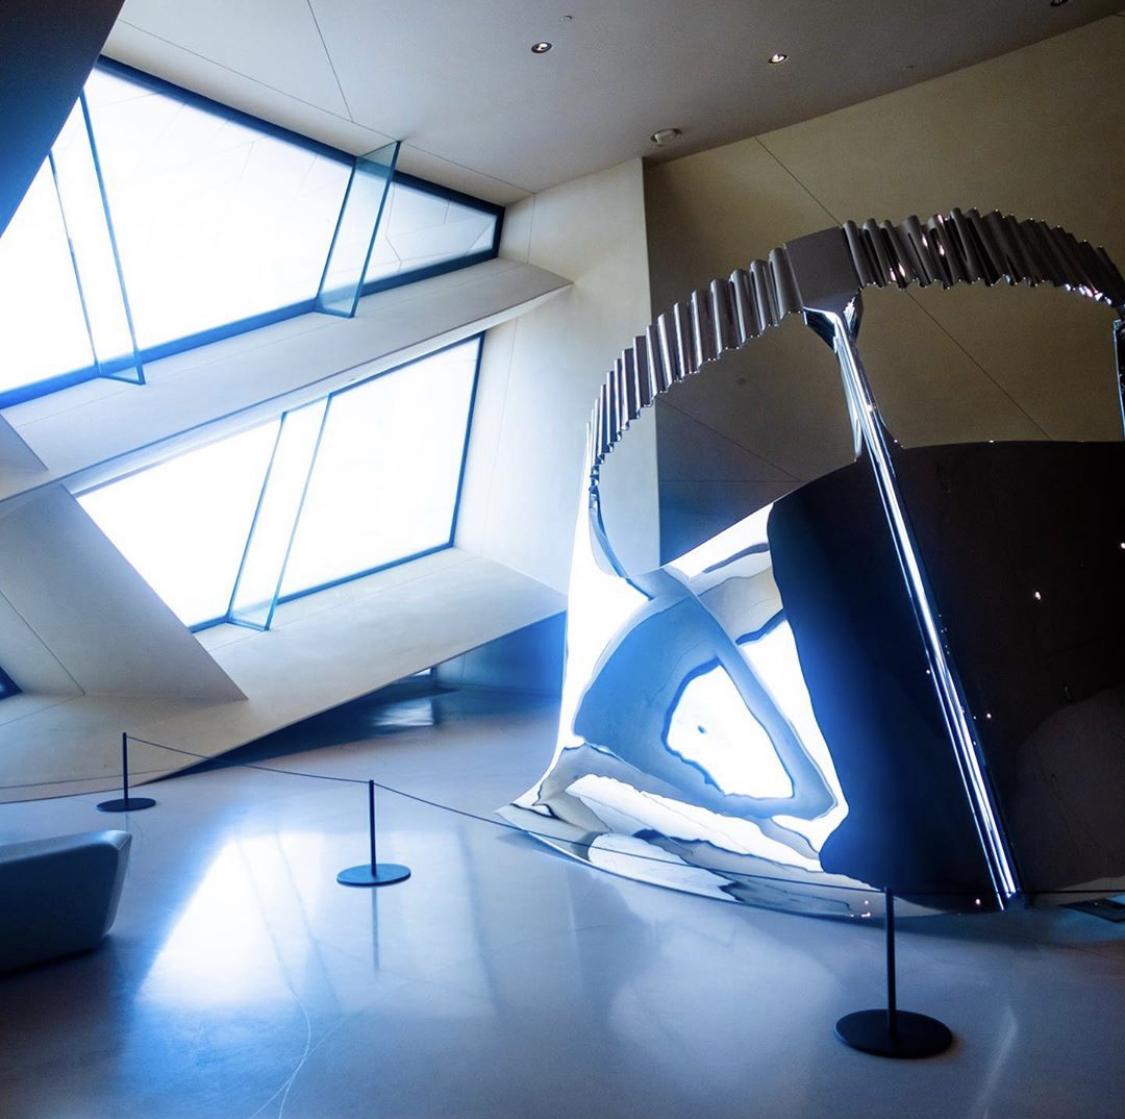 National museum of Qatar, Qatar